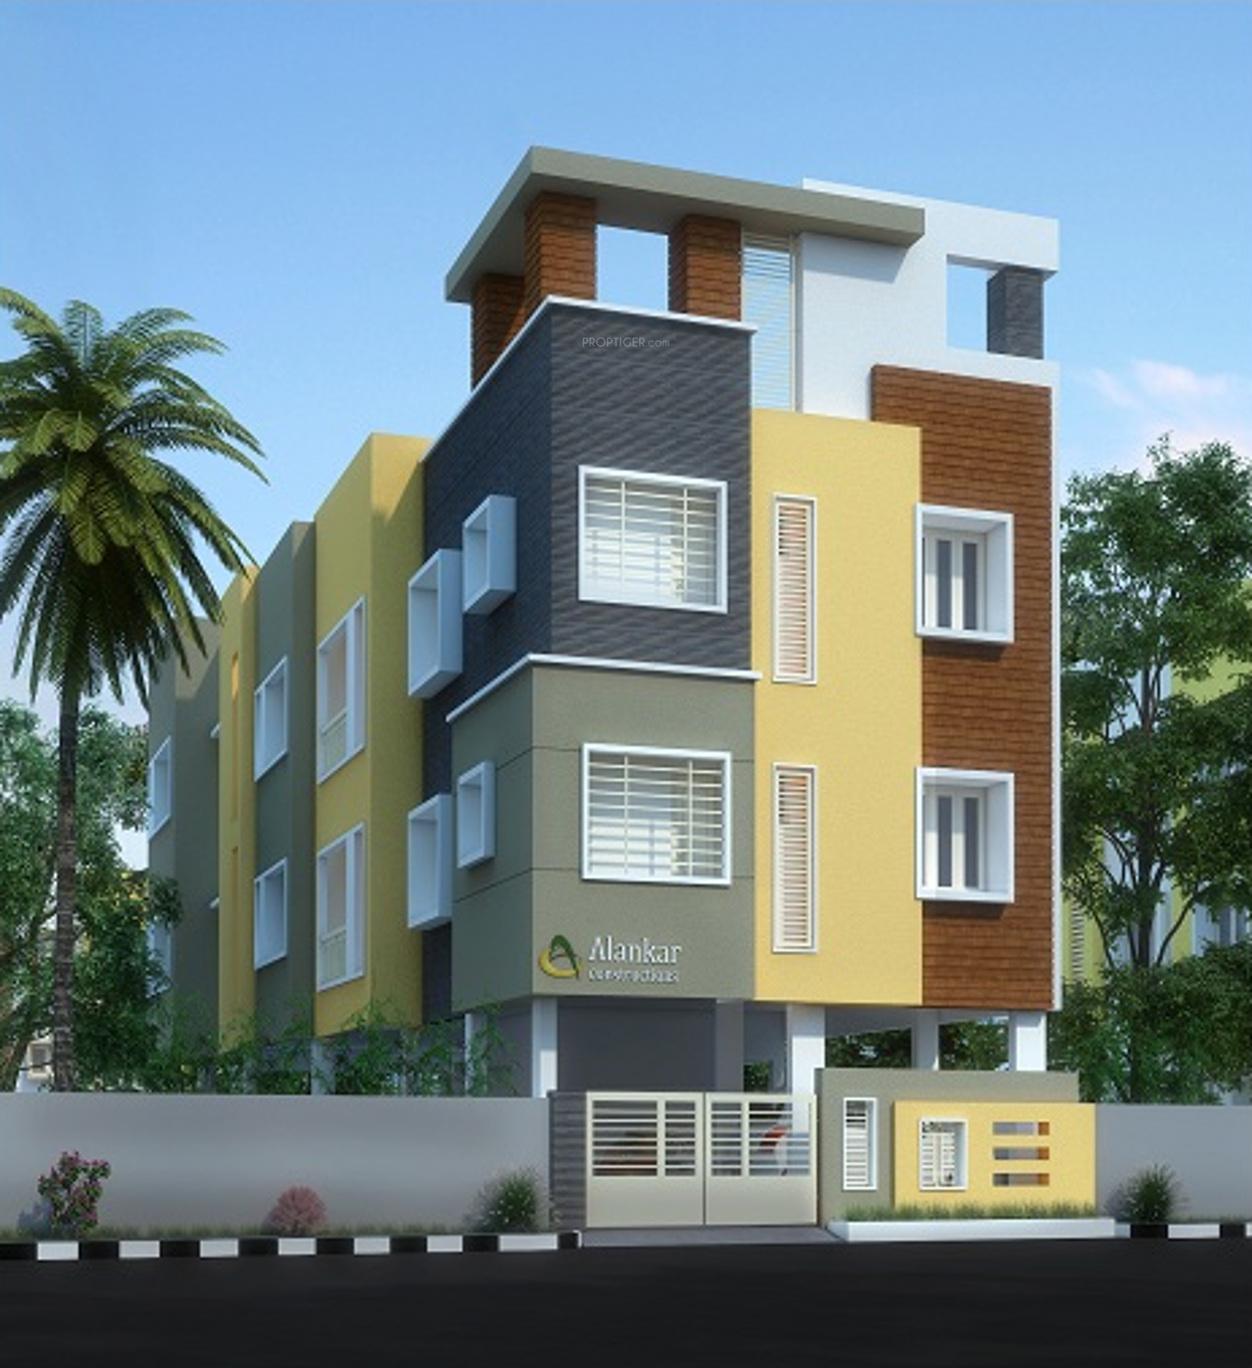 Pinewood Park Apartments: Main Elevation Image Of Alankar Pinewood, Unit Available